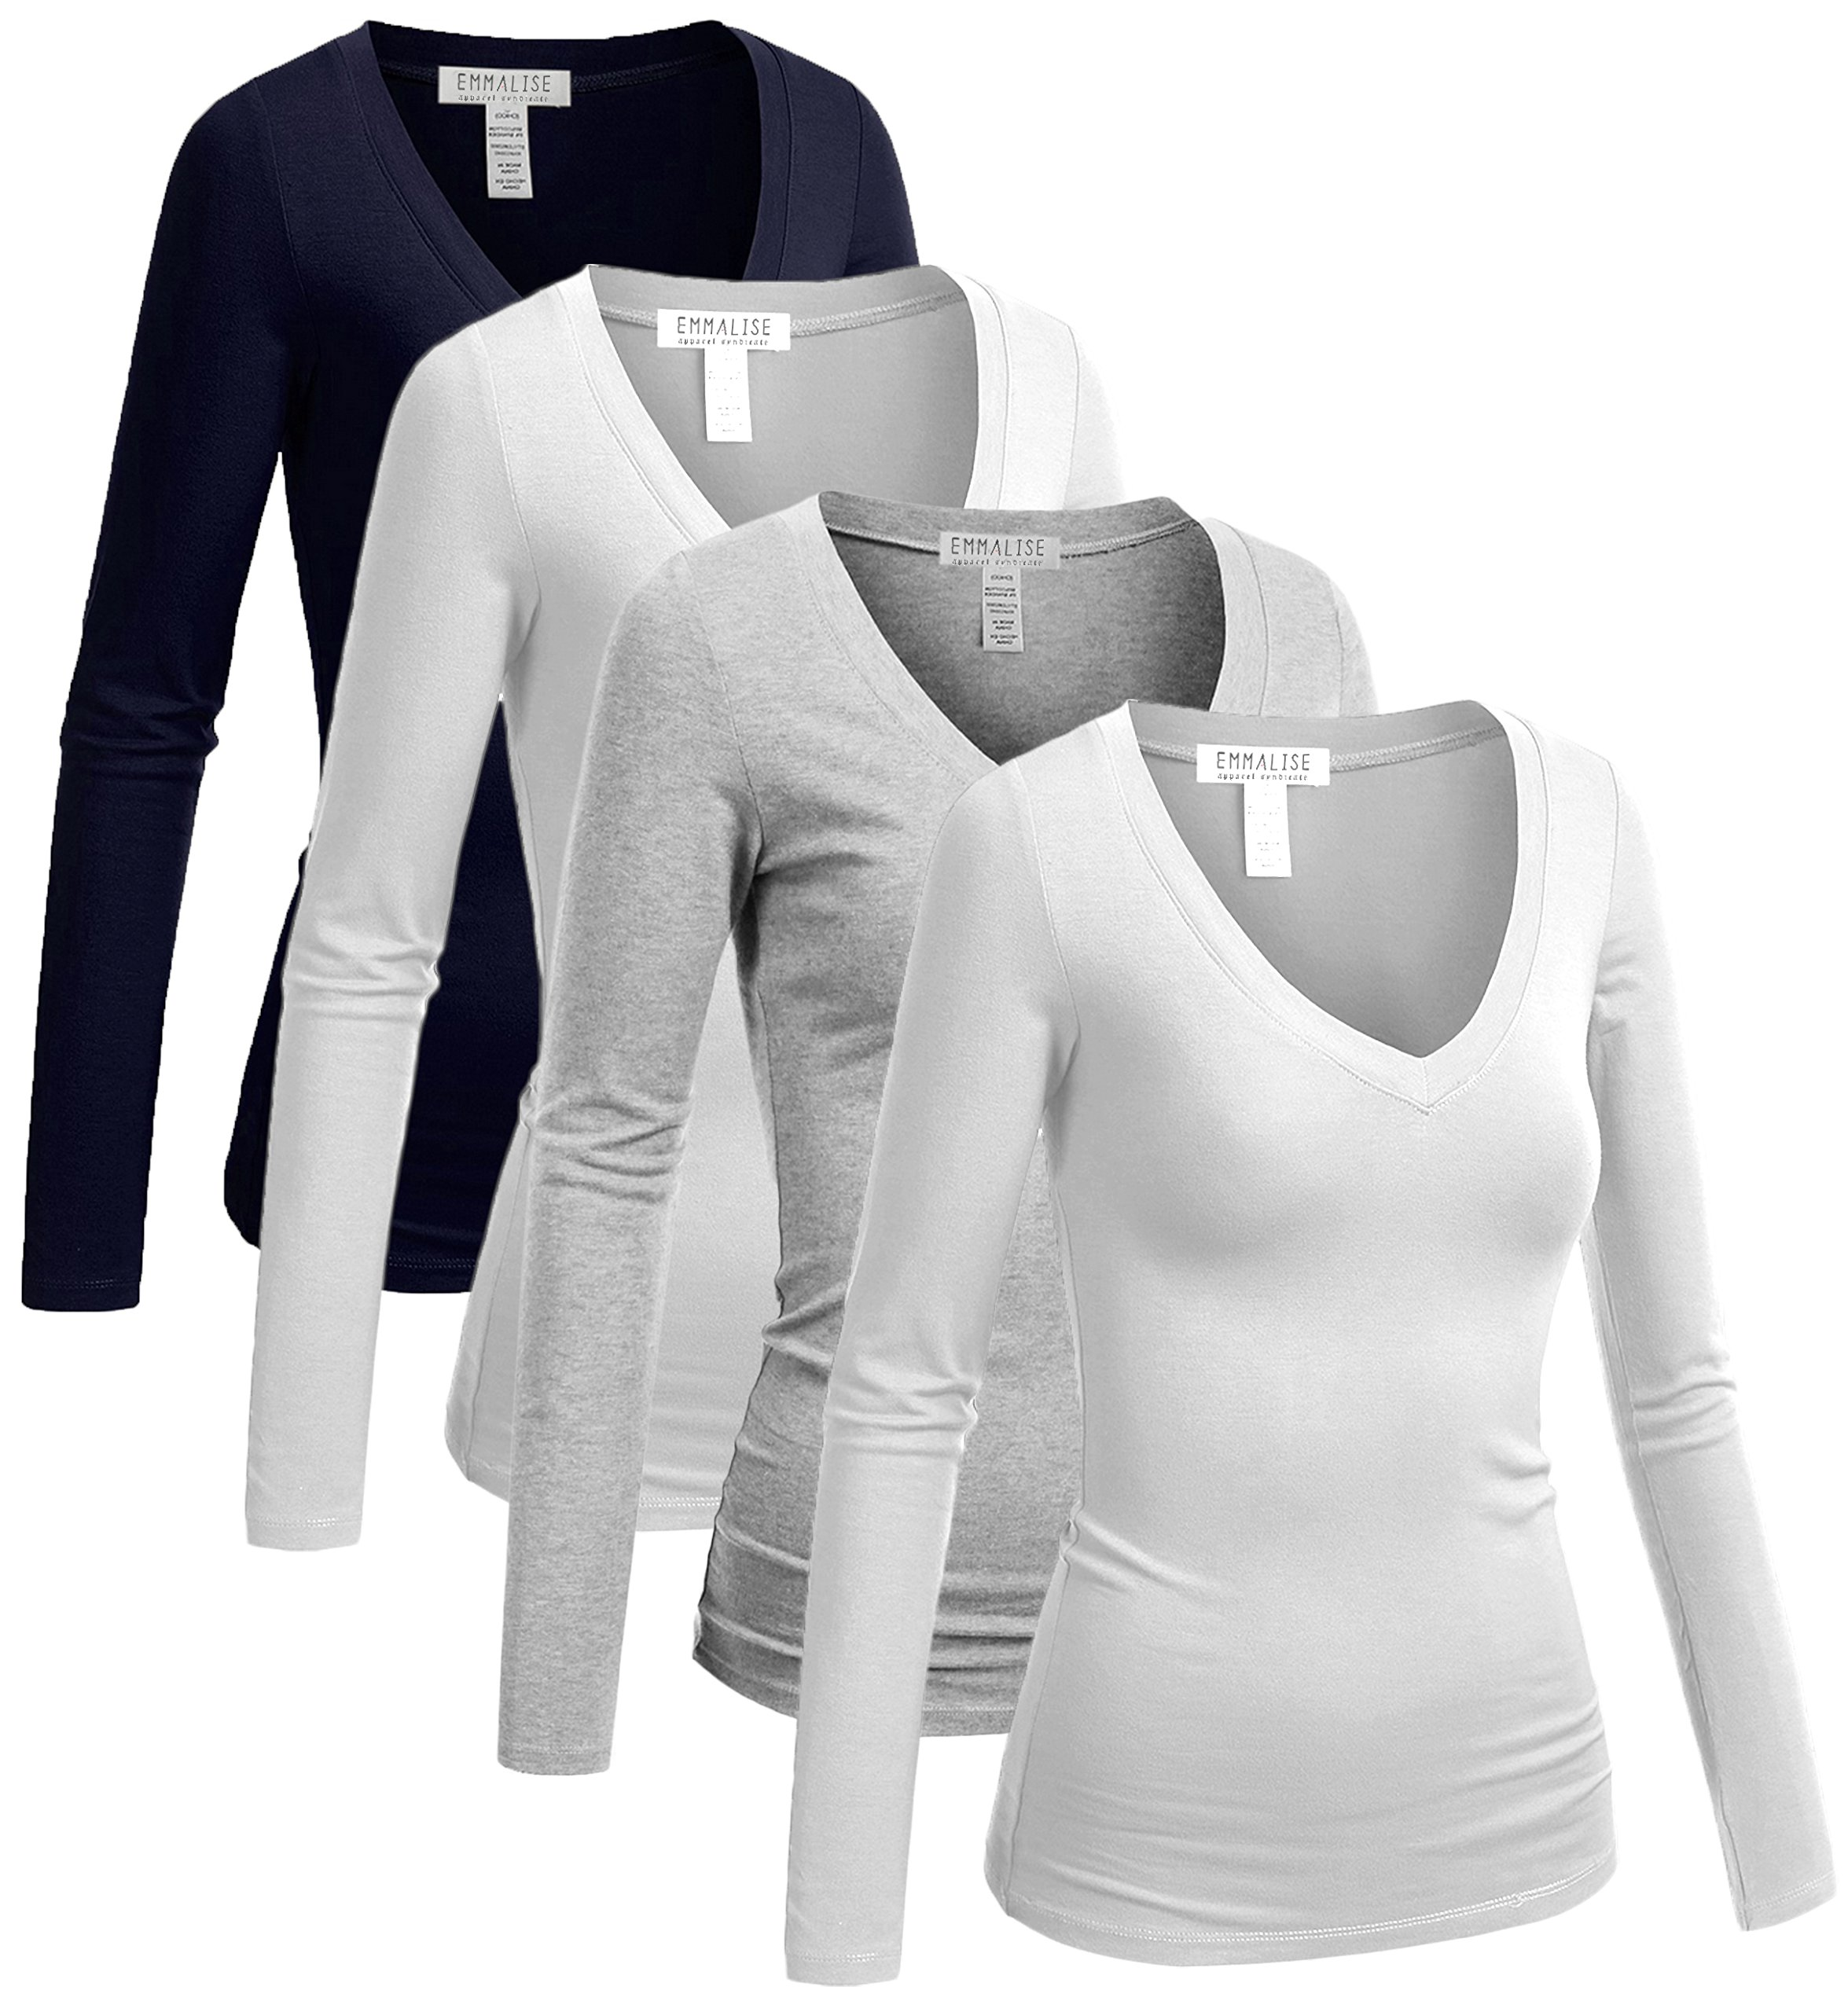 Emmalise Women's Casual Basic V-Neck Tshirt Long Sleeves Tee Top - 4Pk-White,White,H Gray,Navy, 3XL